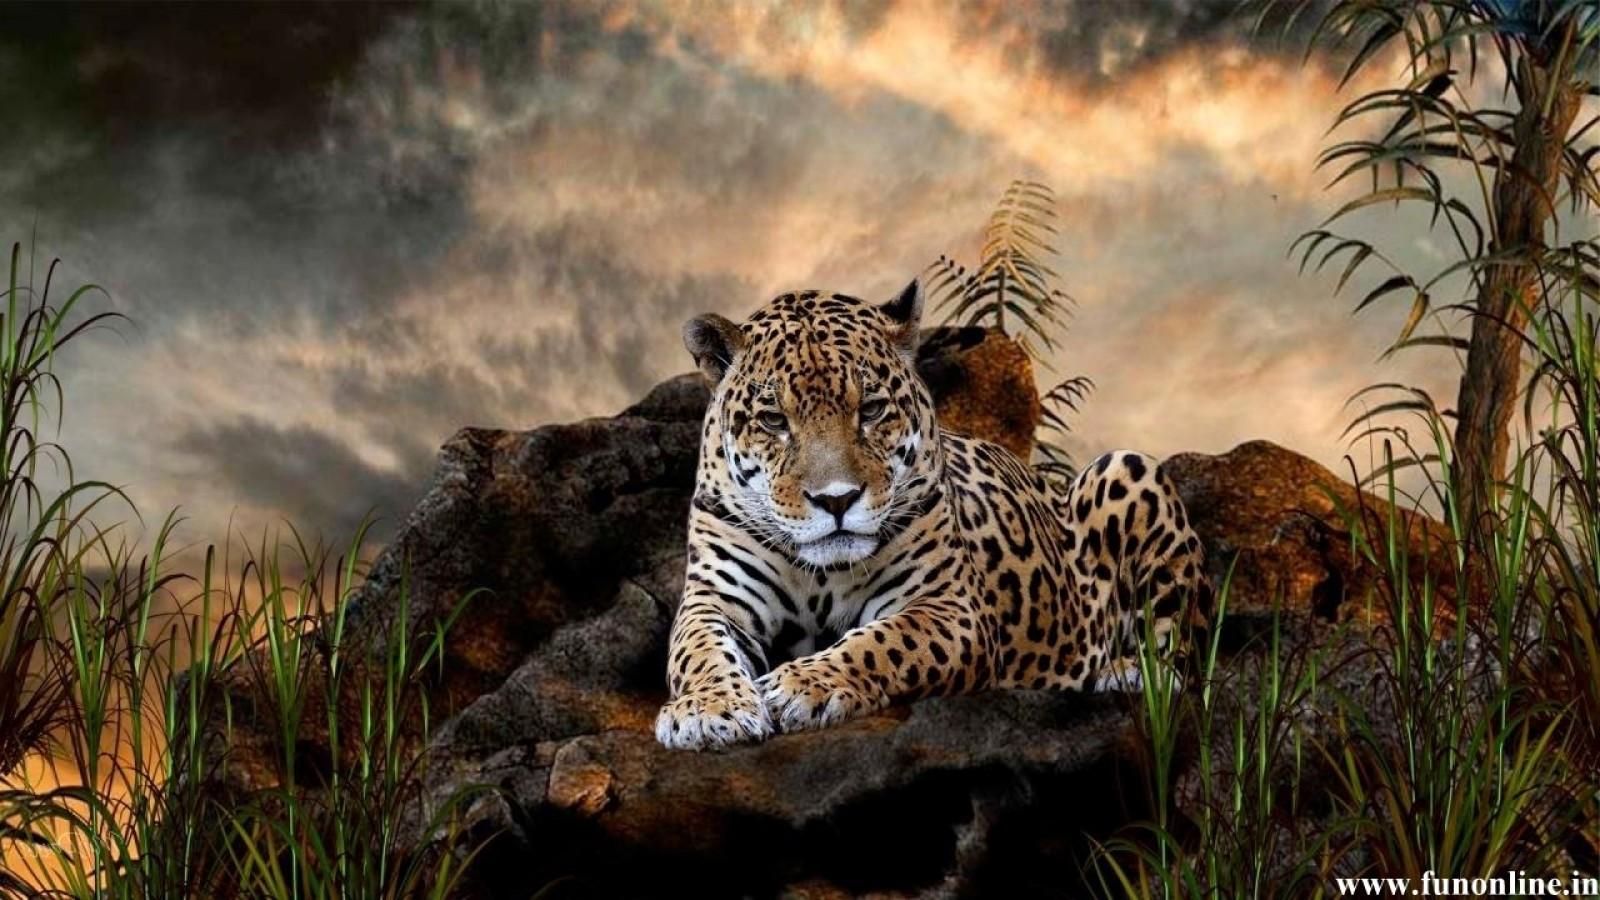 Jaguar wallpapers hd wallpapersafari jaguar wallpapers stunning jaguar hd wallpapers for download 1600x900 voltagebd Images